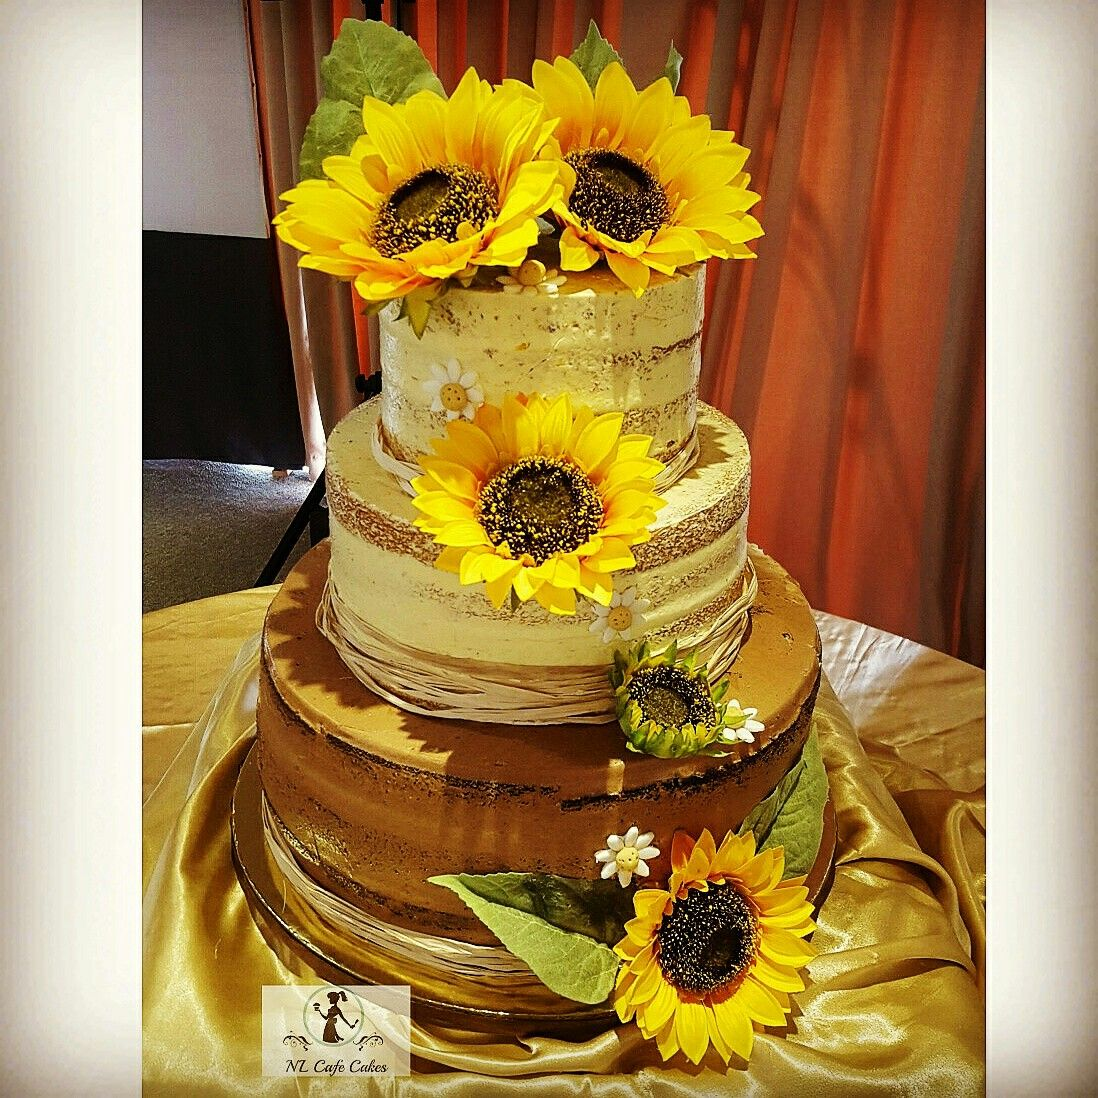 sunflower rustic semi naked wedding cake my decorations pinterest wedding cake wedding. Black Bedroom Furniture Sets. Home Design Ideas